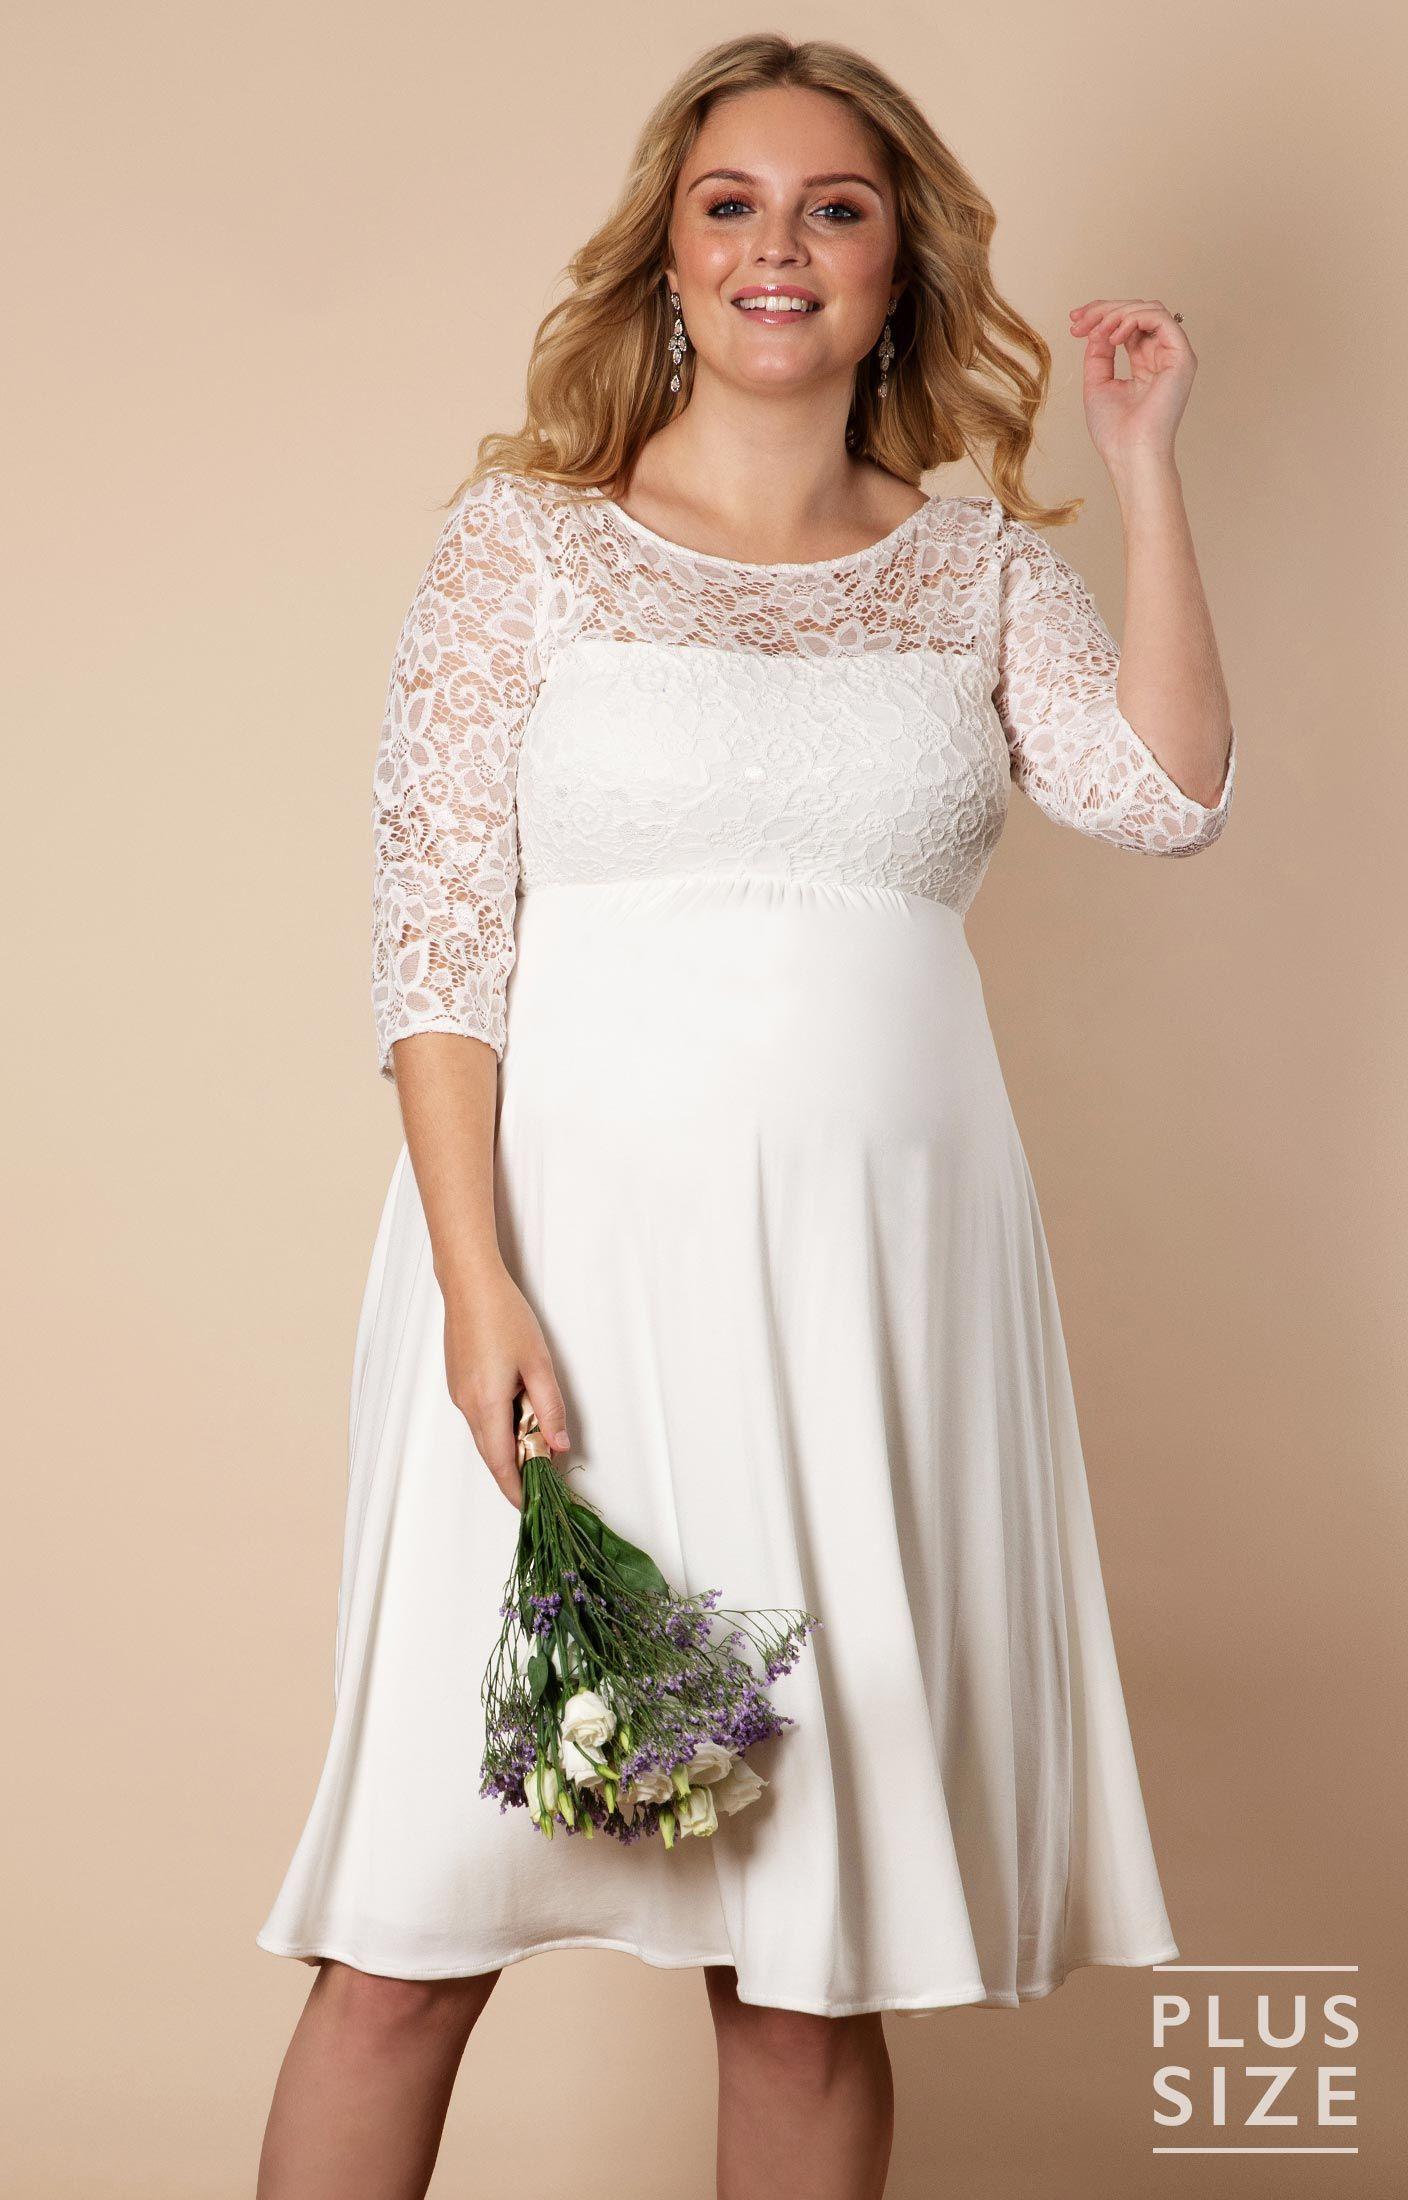 9a42855a69a3e Lucia Dress Plus in 2019 | Wedding | Pregnant wedding dress ...